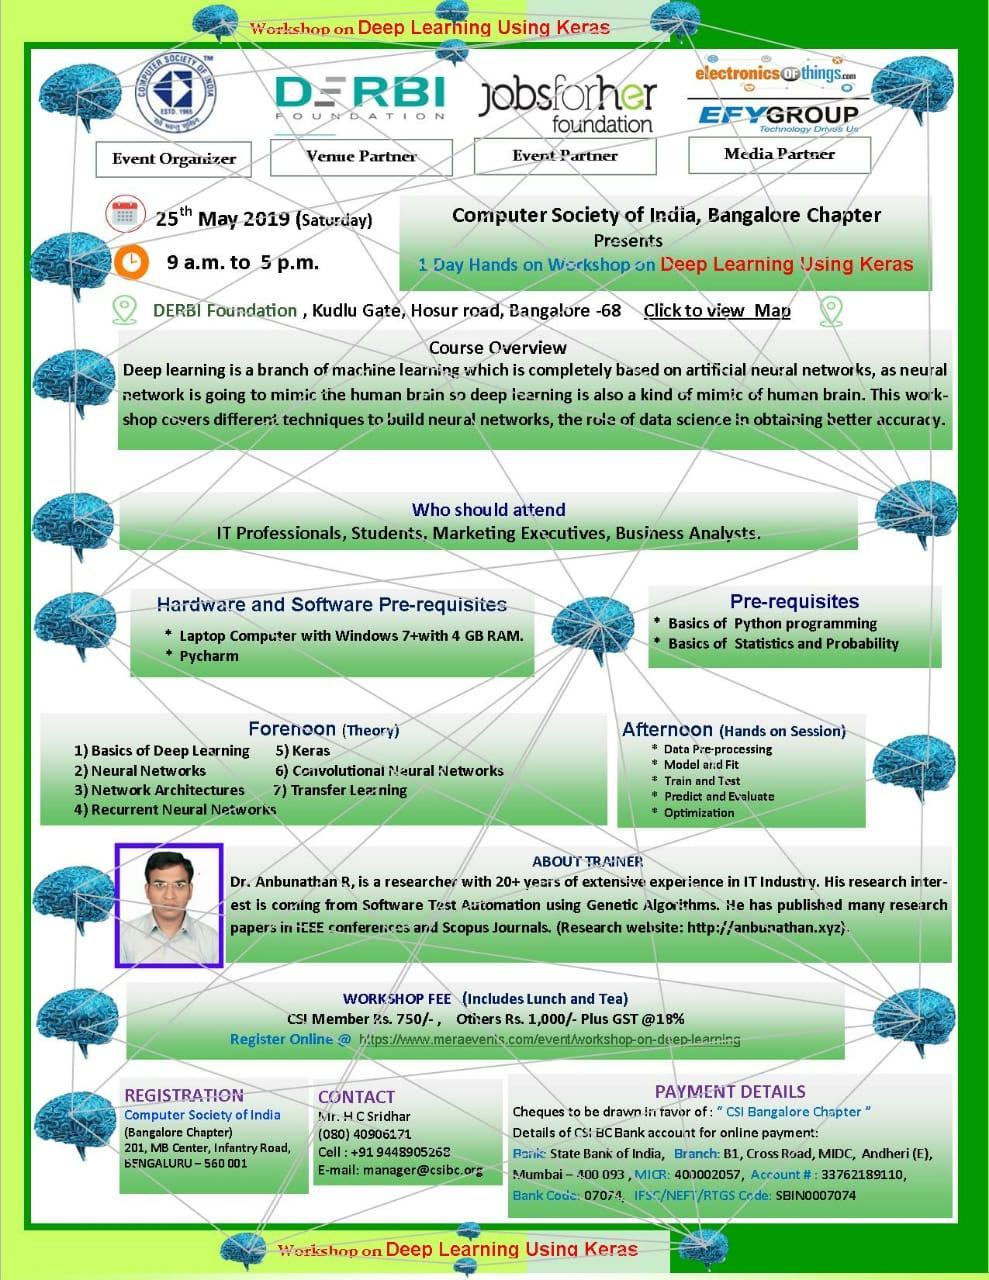 Workshop on Deep Learning - Bengaluru | MeraEvents com